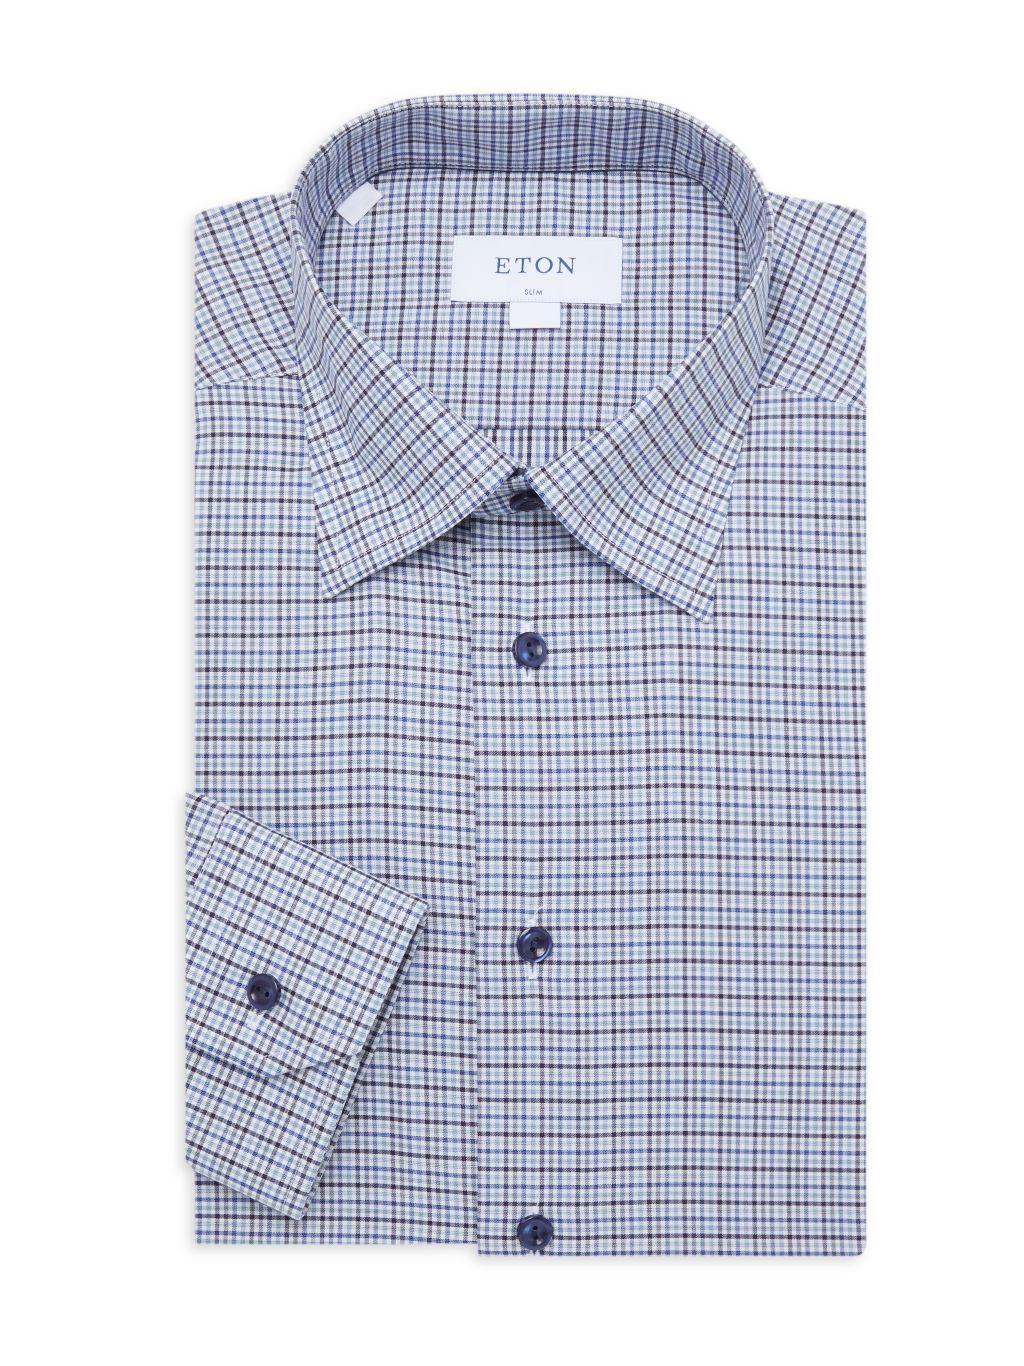 Eton Slim-Fit Tattersall Dress Shirt